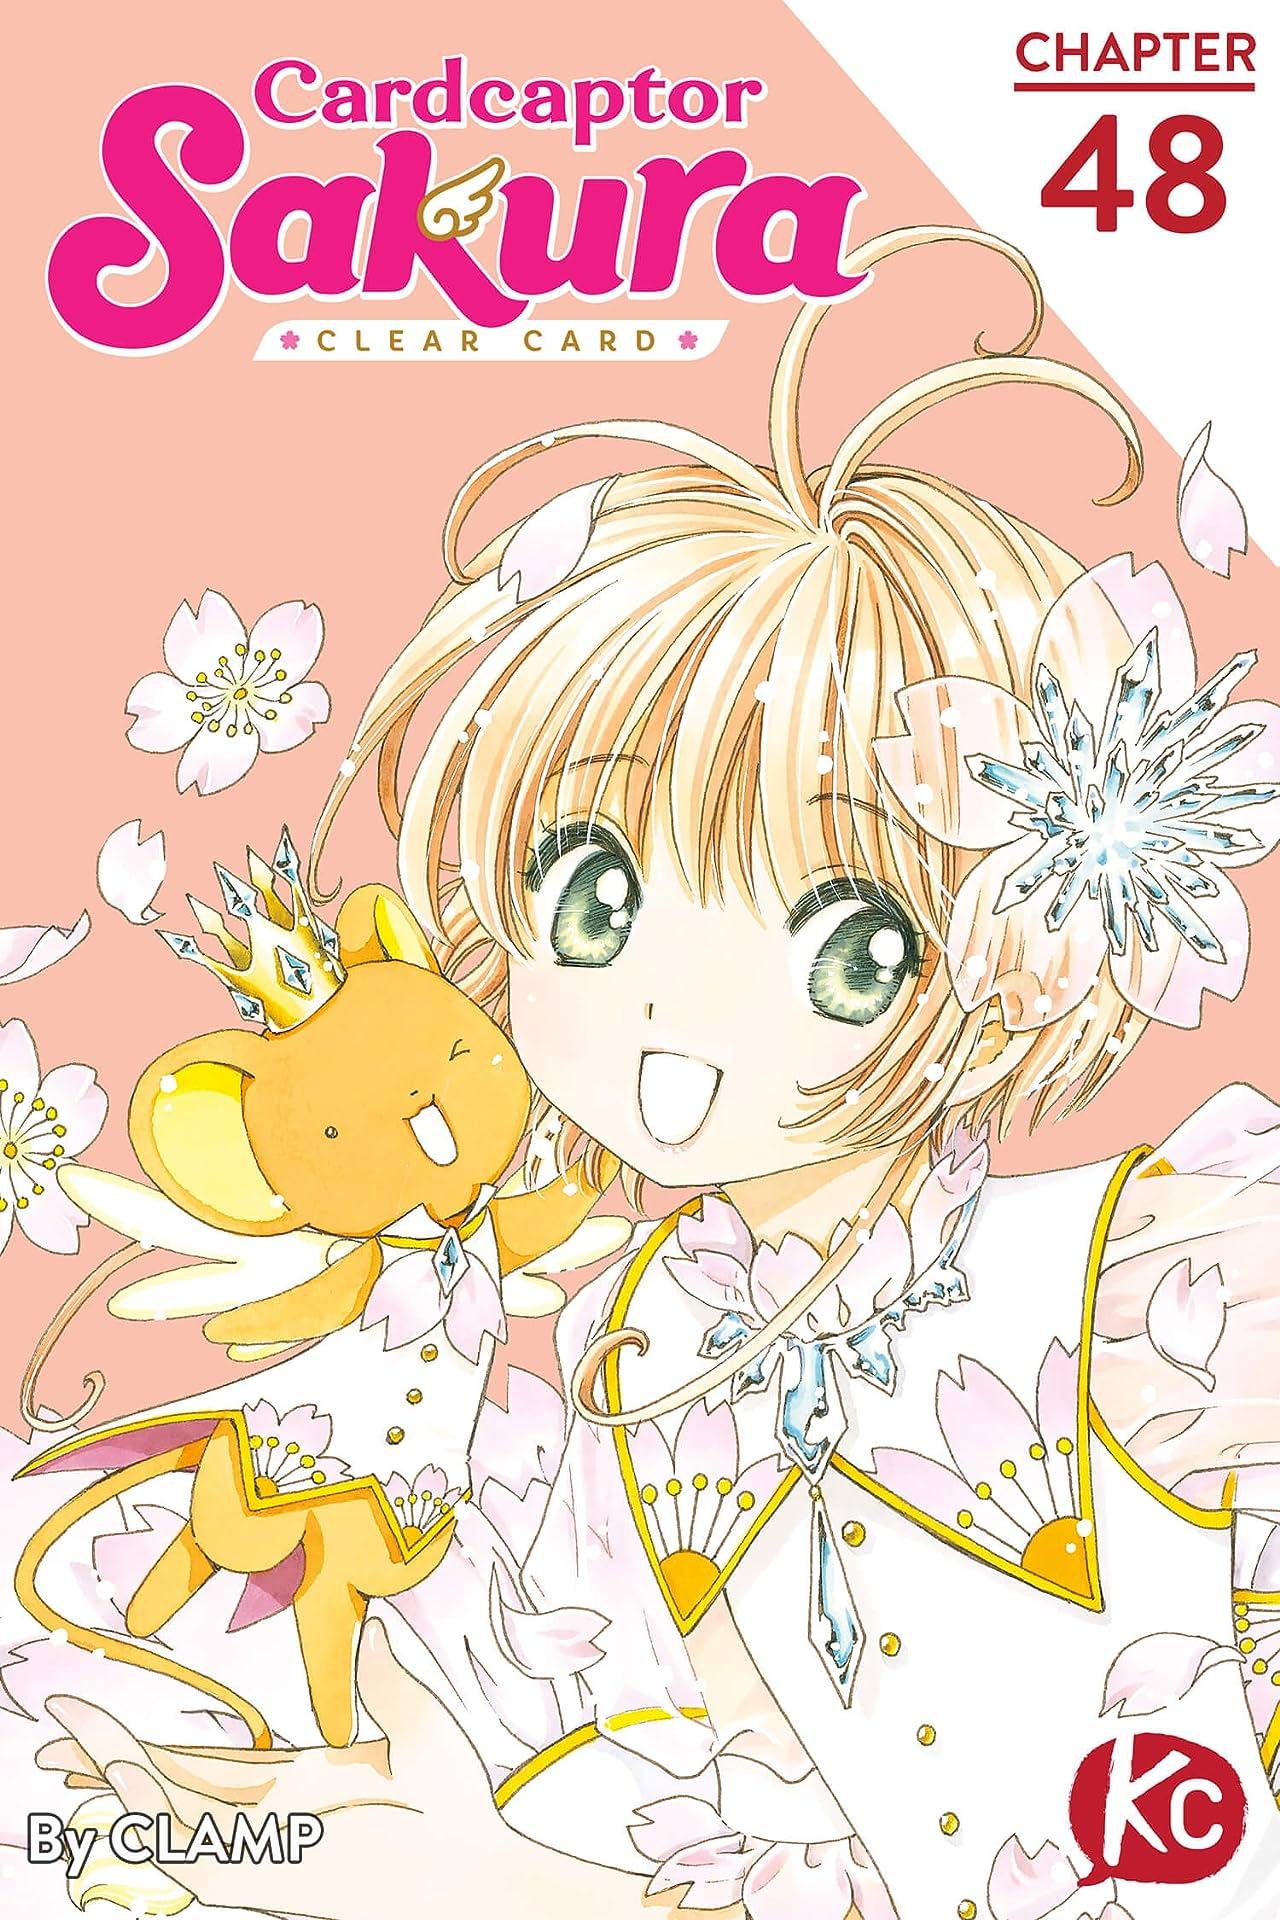 Cardcaptor Sakura: Clear Card #48